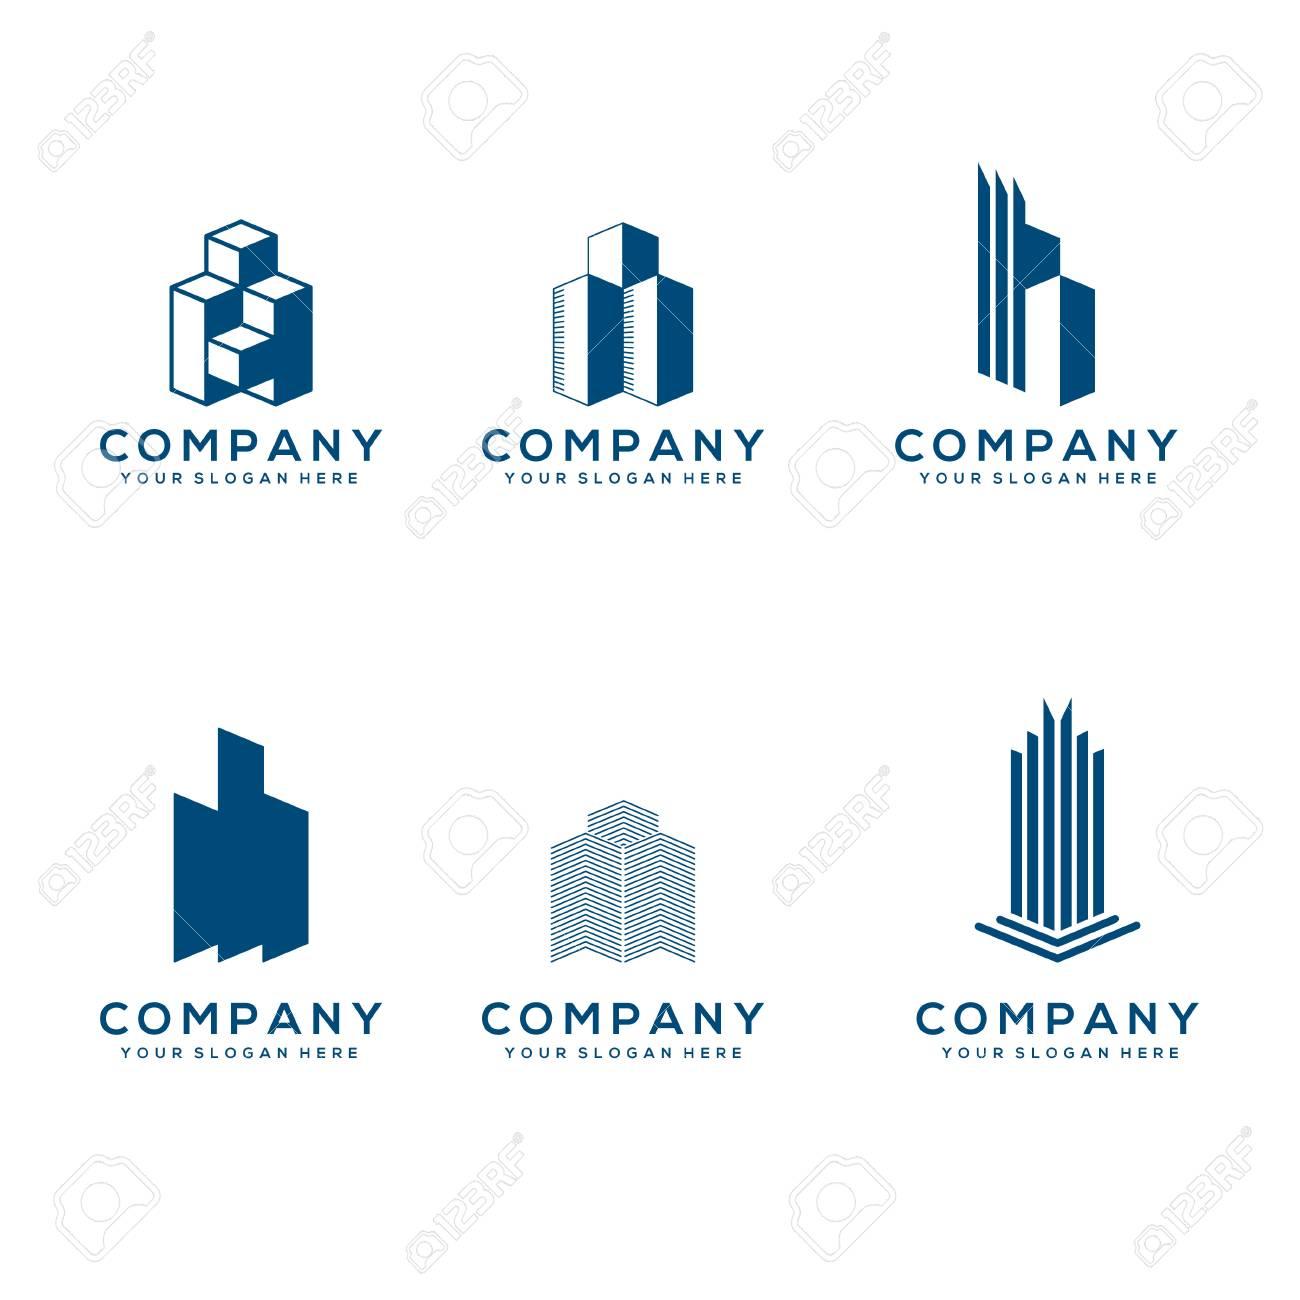 Archivio Fotografico - Real Estate Logo Collection